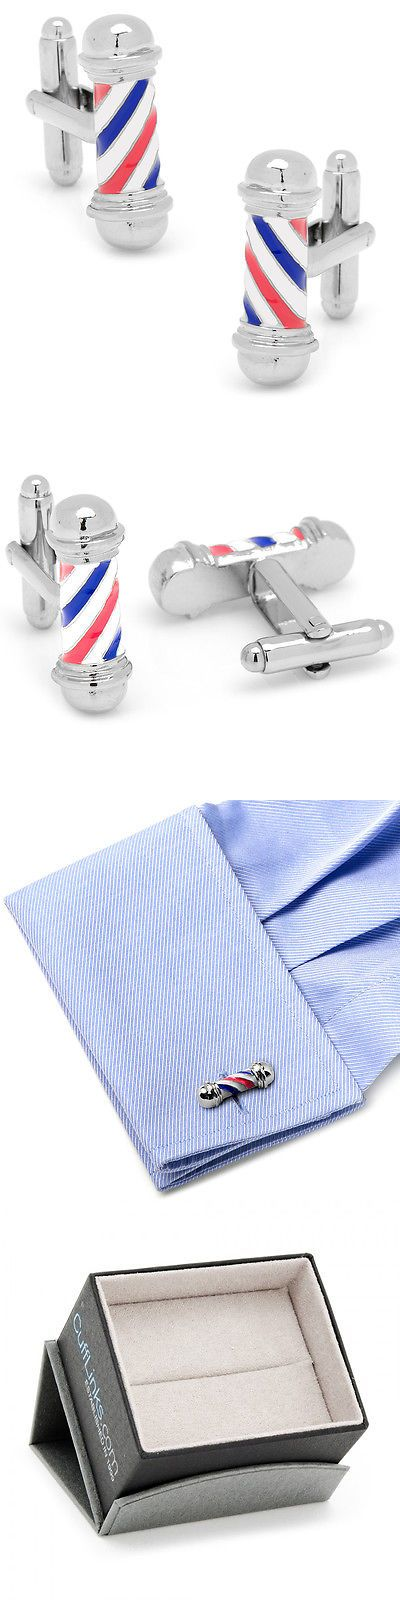 Cufflinks 137843: Cufflinks, Inc. Classic Barber Shop Pole Cufflinks -> BUY IT NOW ONLY: $64.95 on eBay!